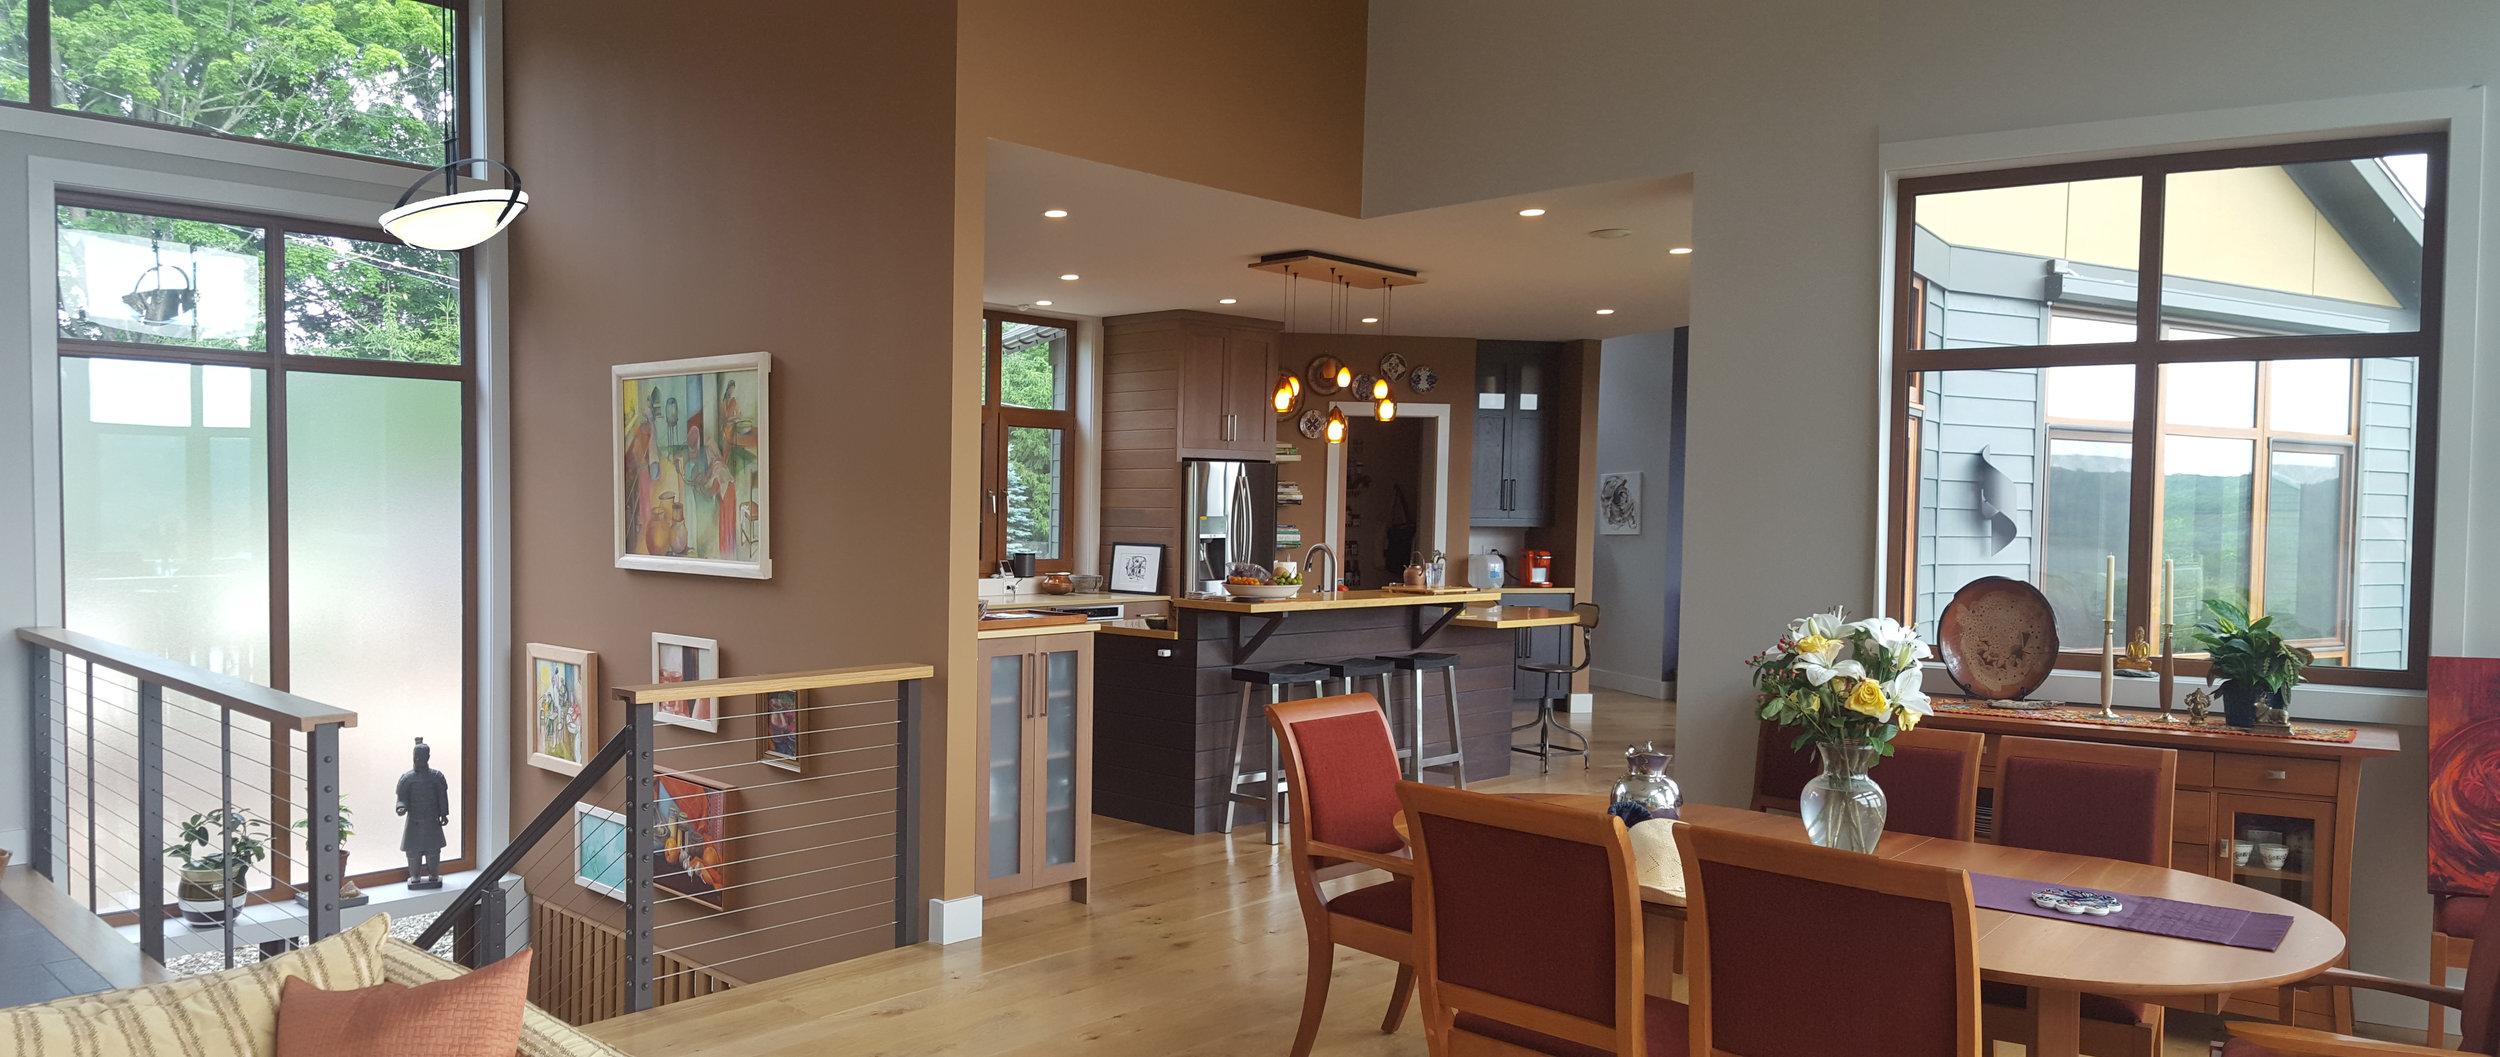 ridgefield-modern-hillside-house-interior.jpg